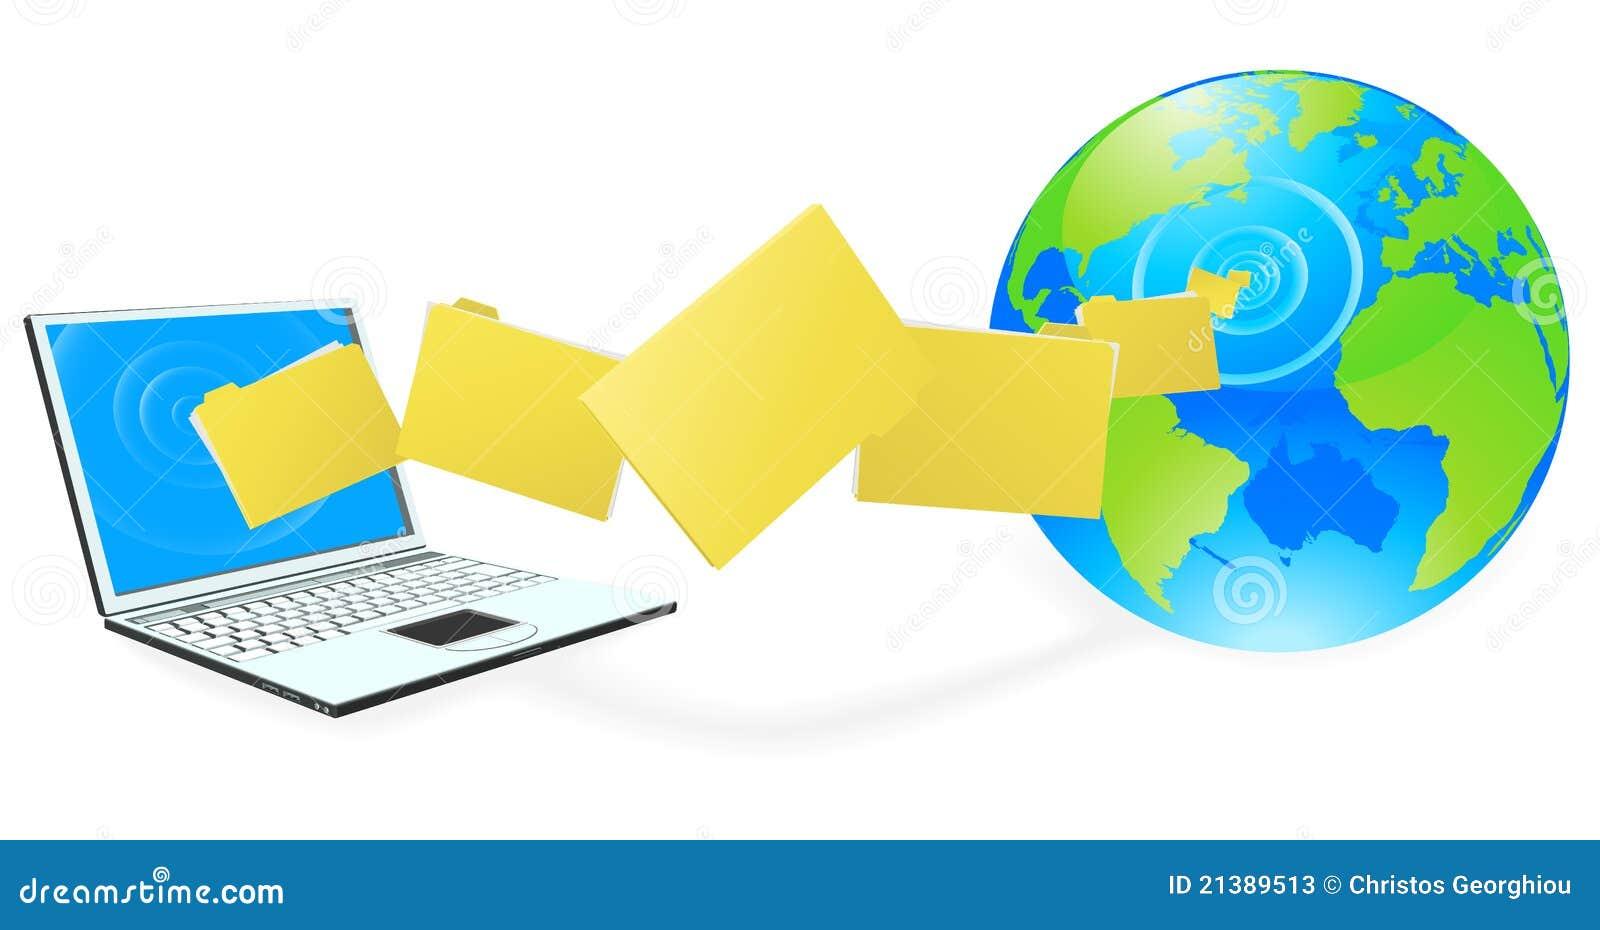 Laptop Computer Uploading Or Downloading Files Stock ...